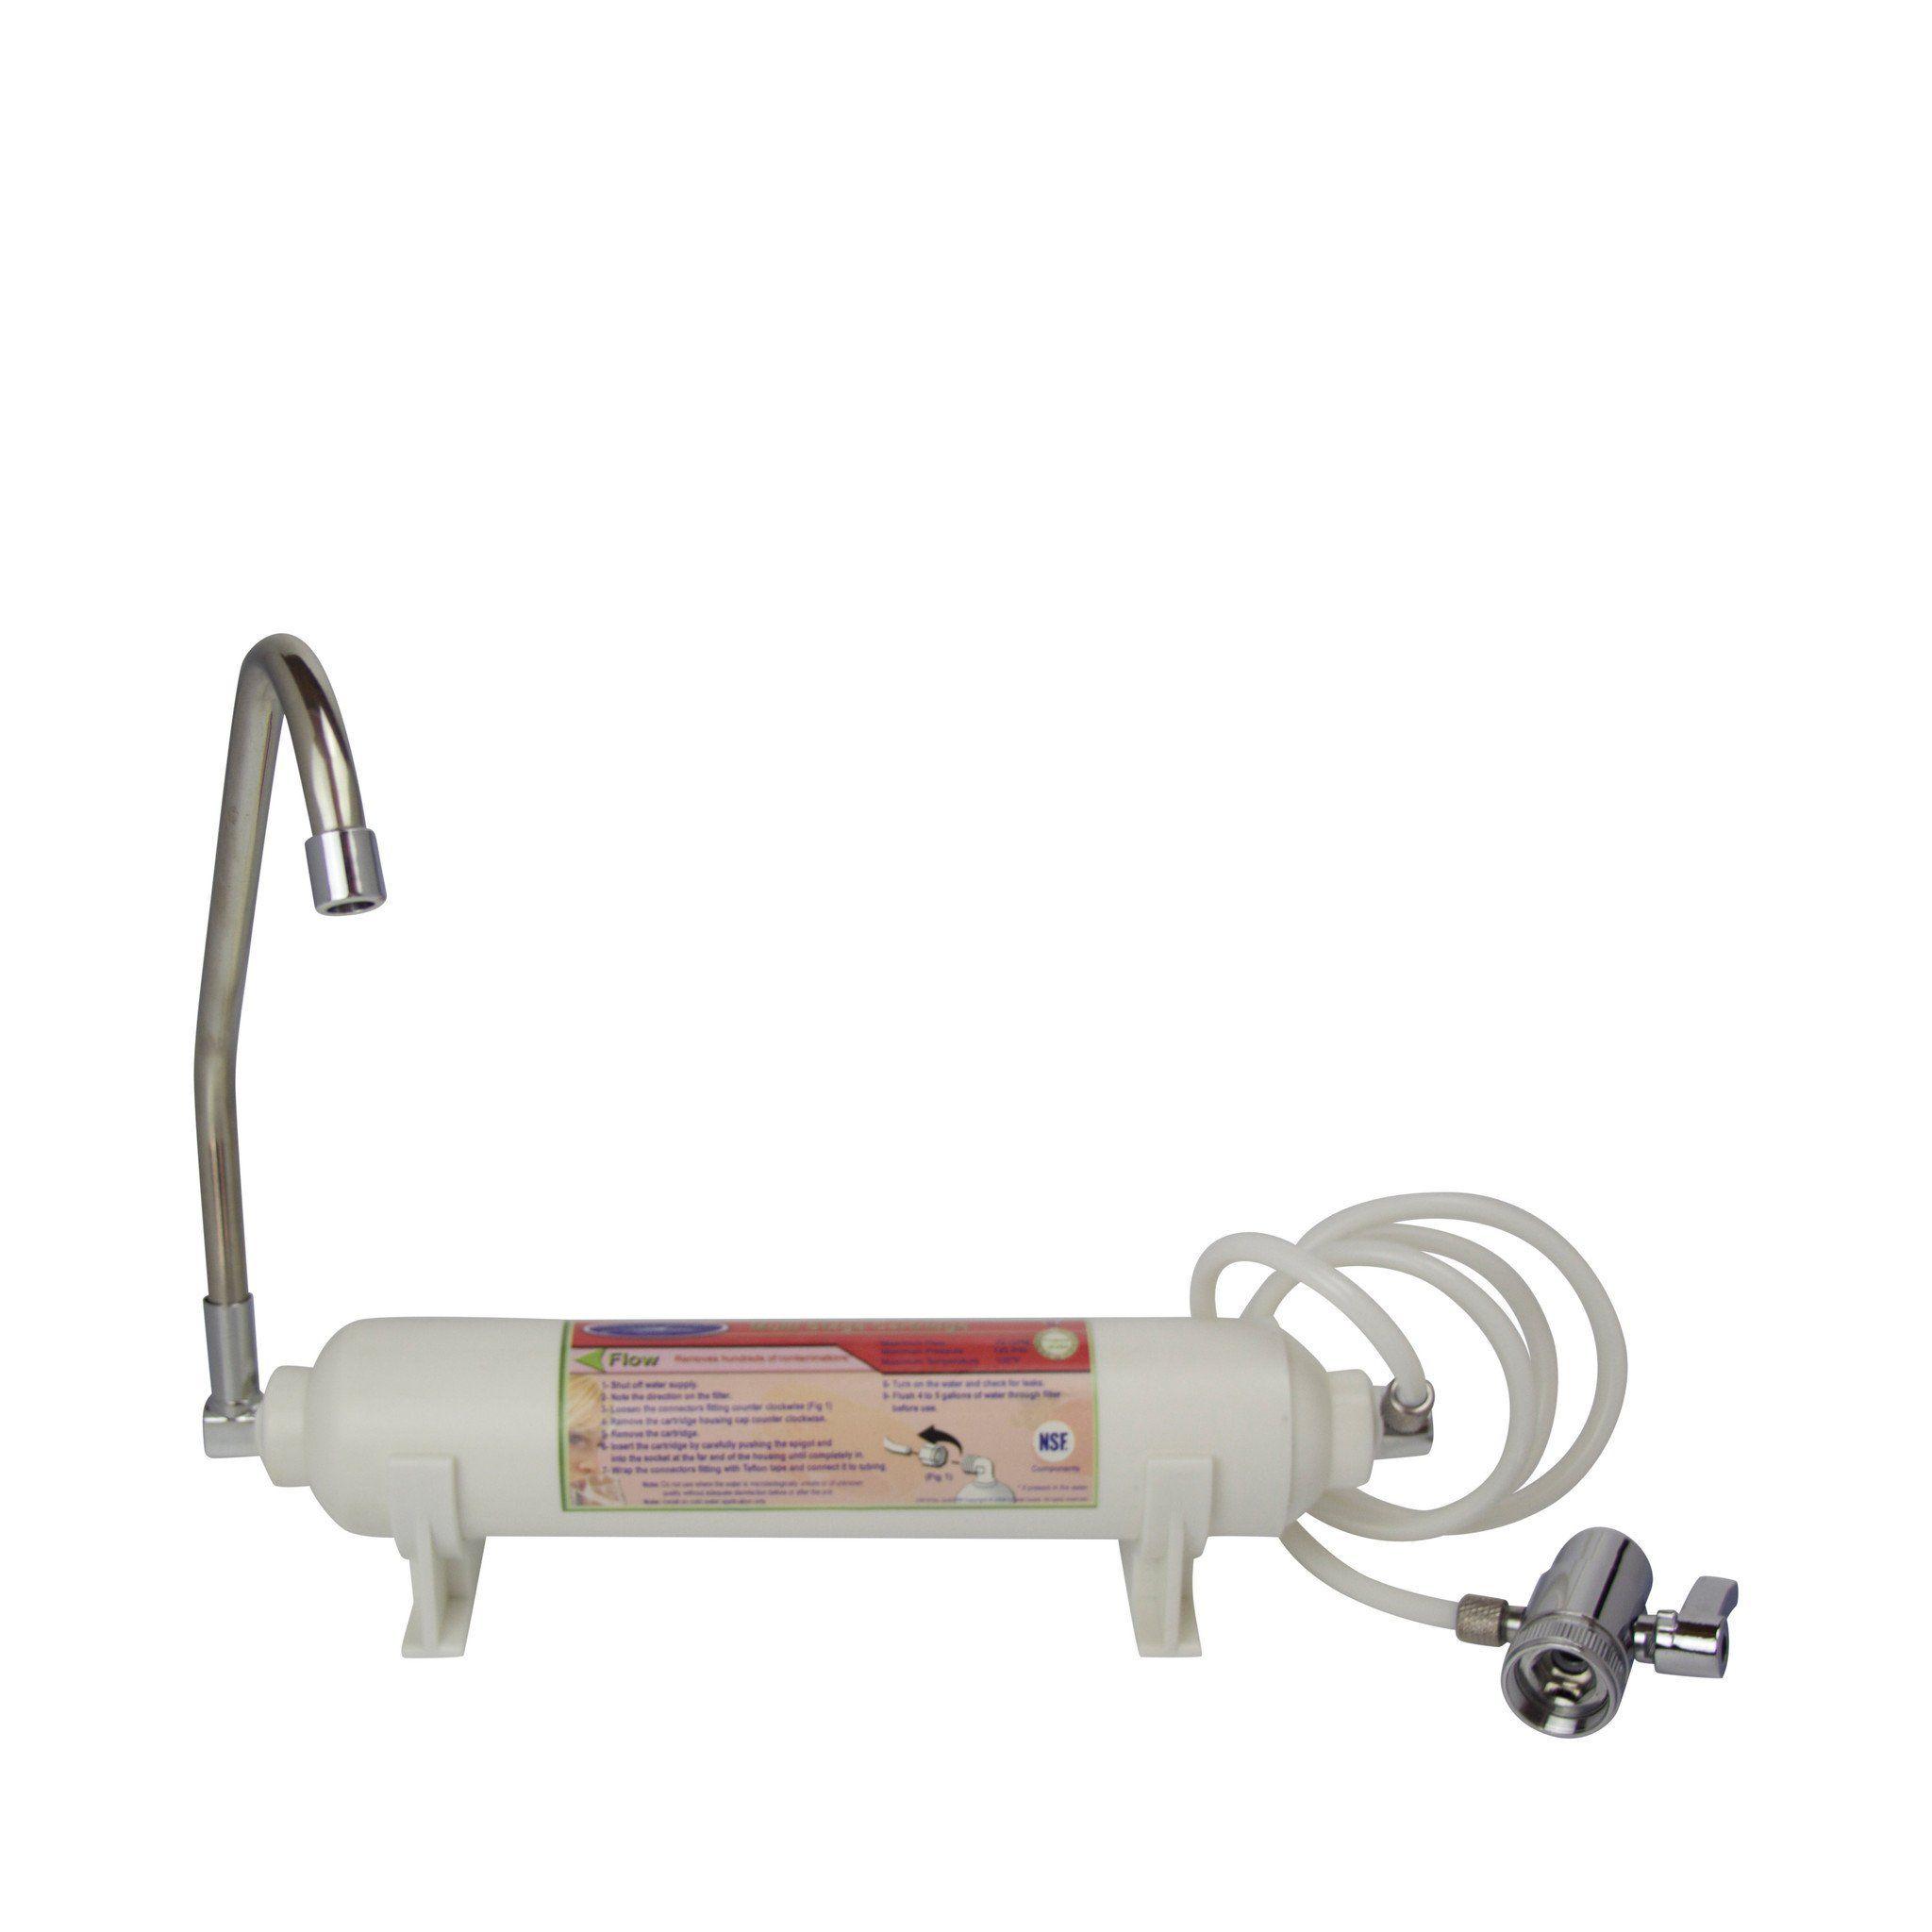 Mini Disposable Countertop Water Filter System Countertop Water